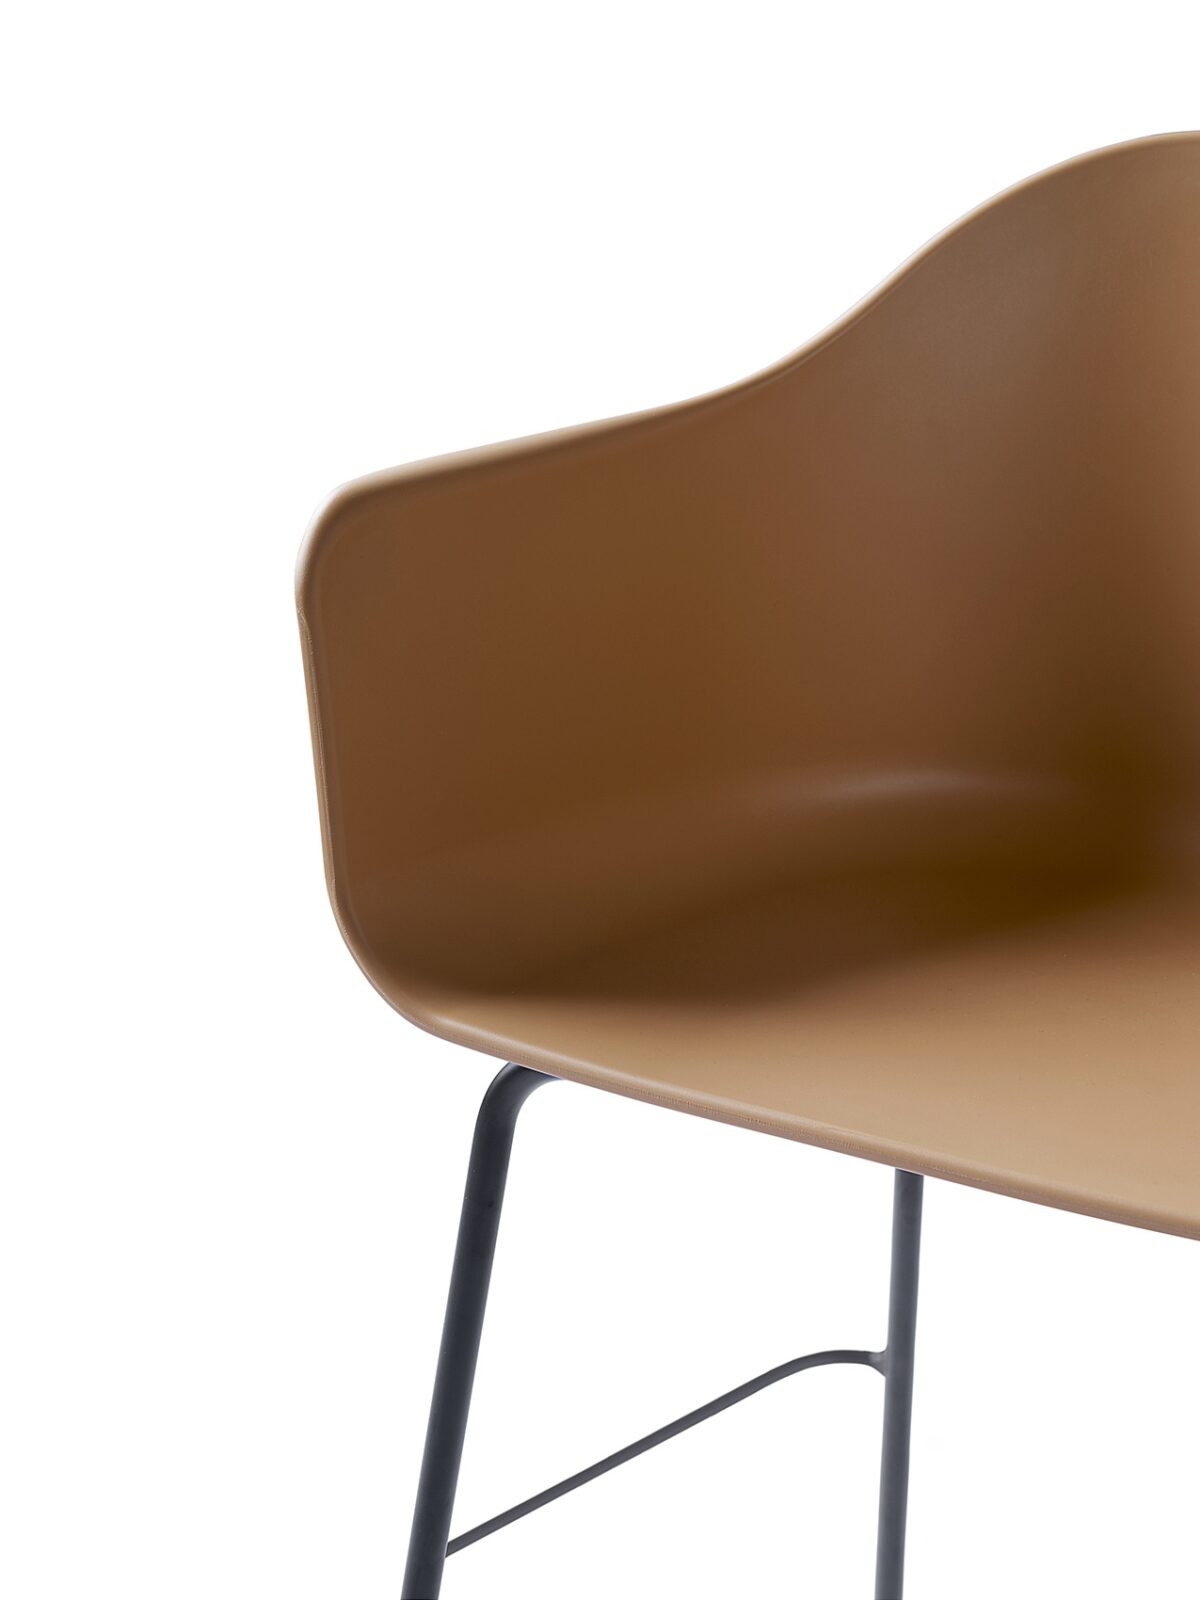 9365849 Harbour Chair counter Khaki Black Detail